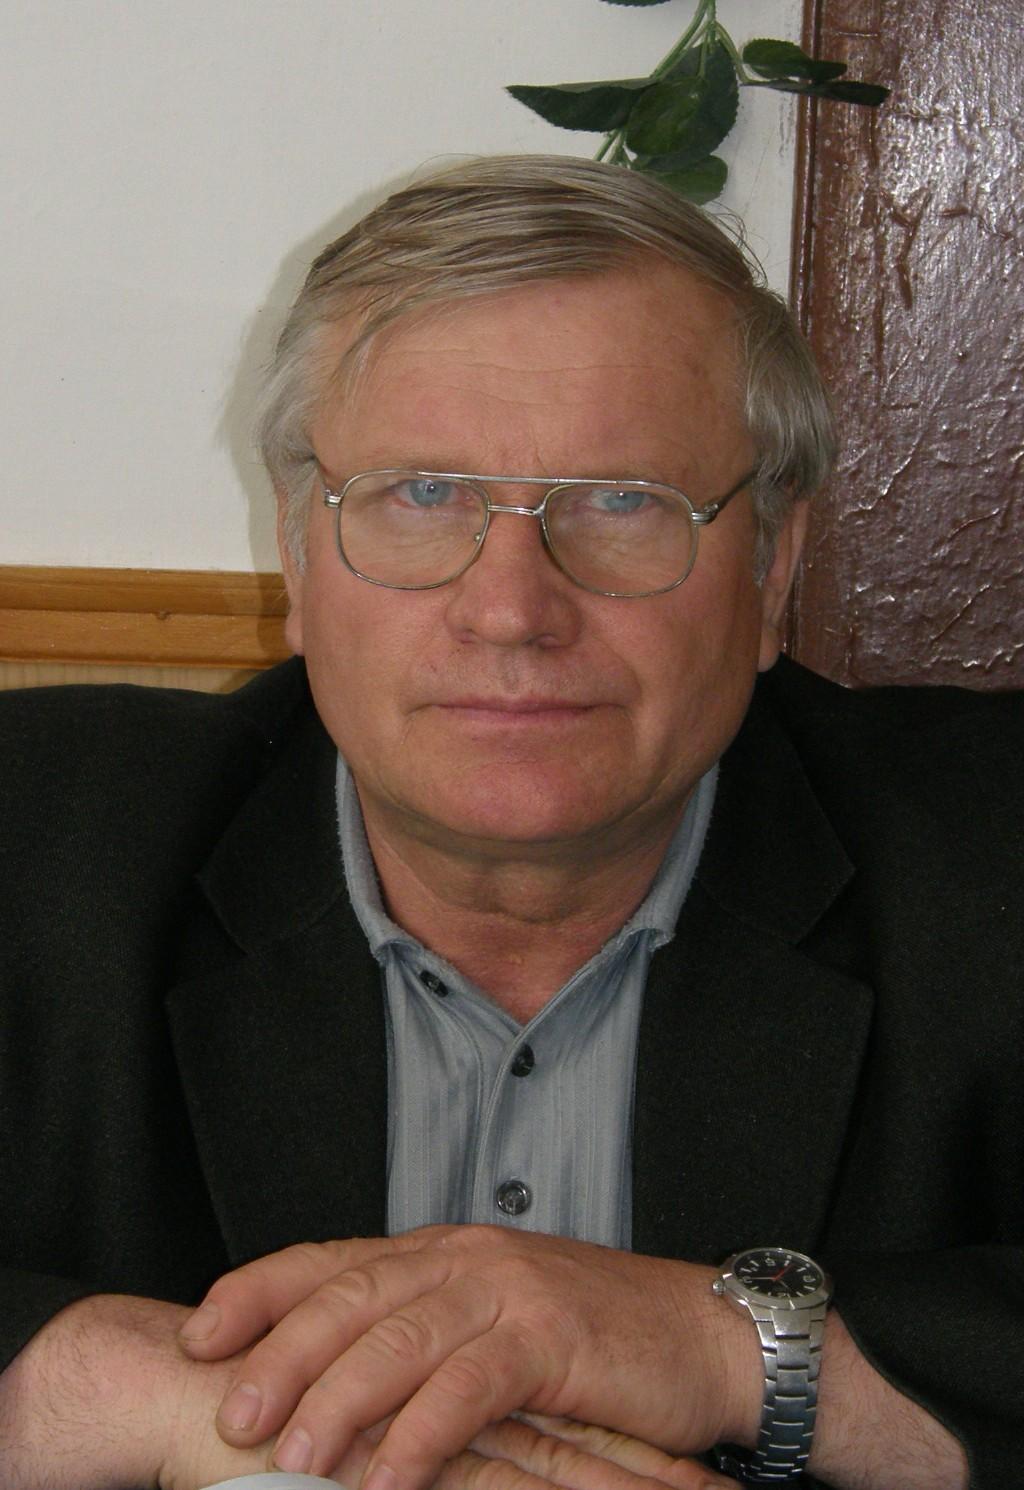 Ятло Михаил Григорьевич